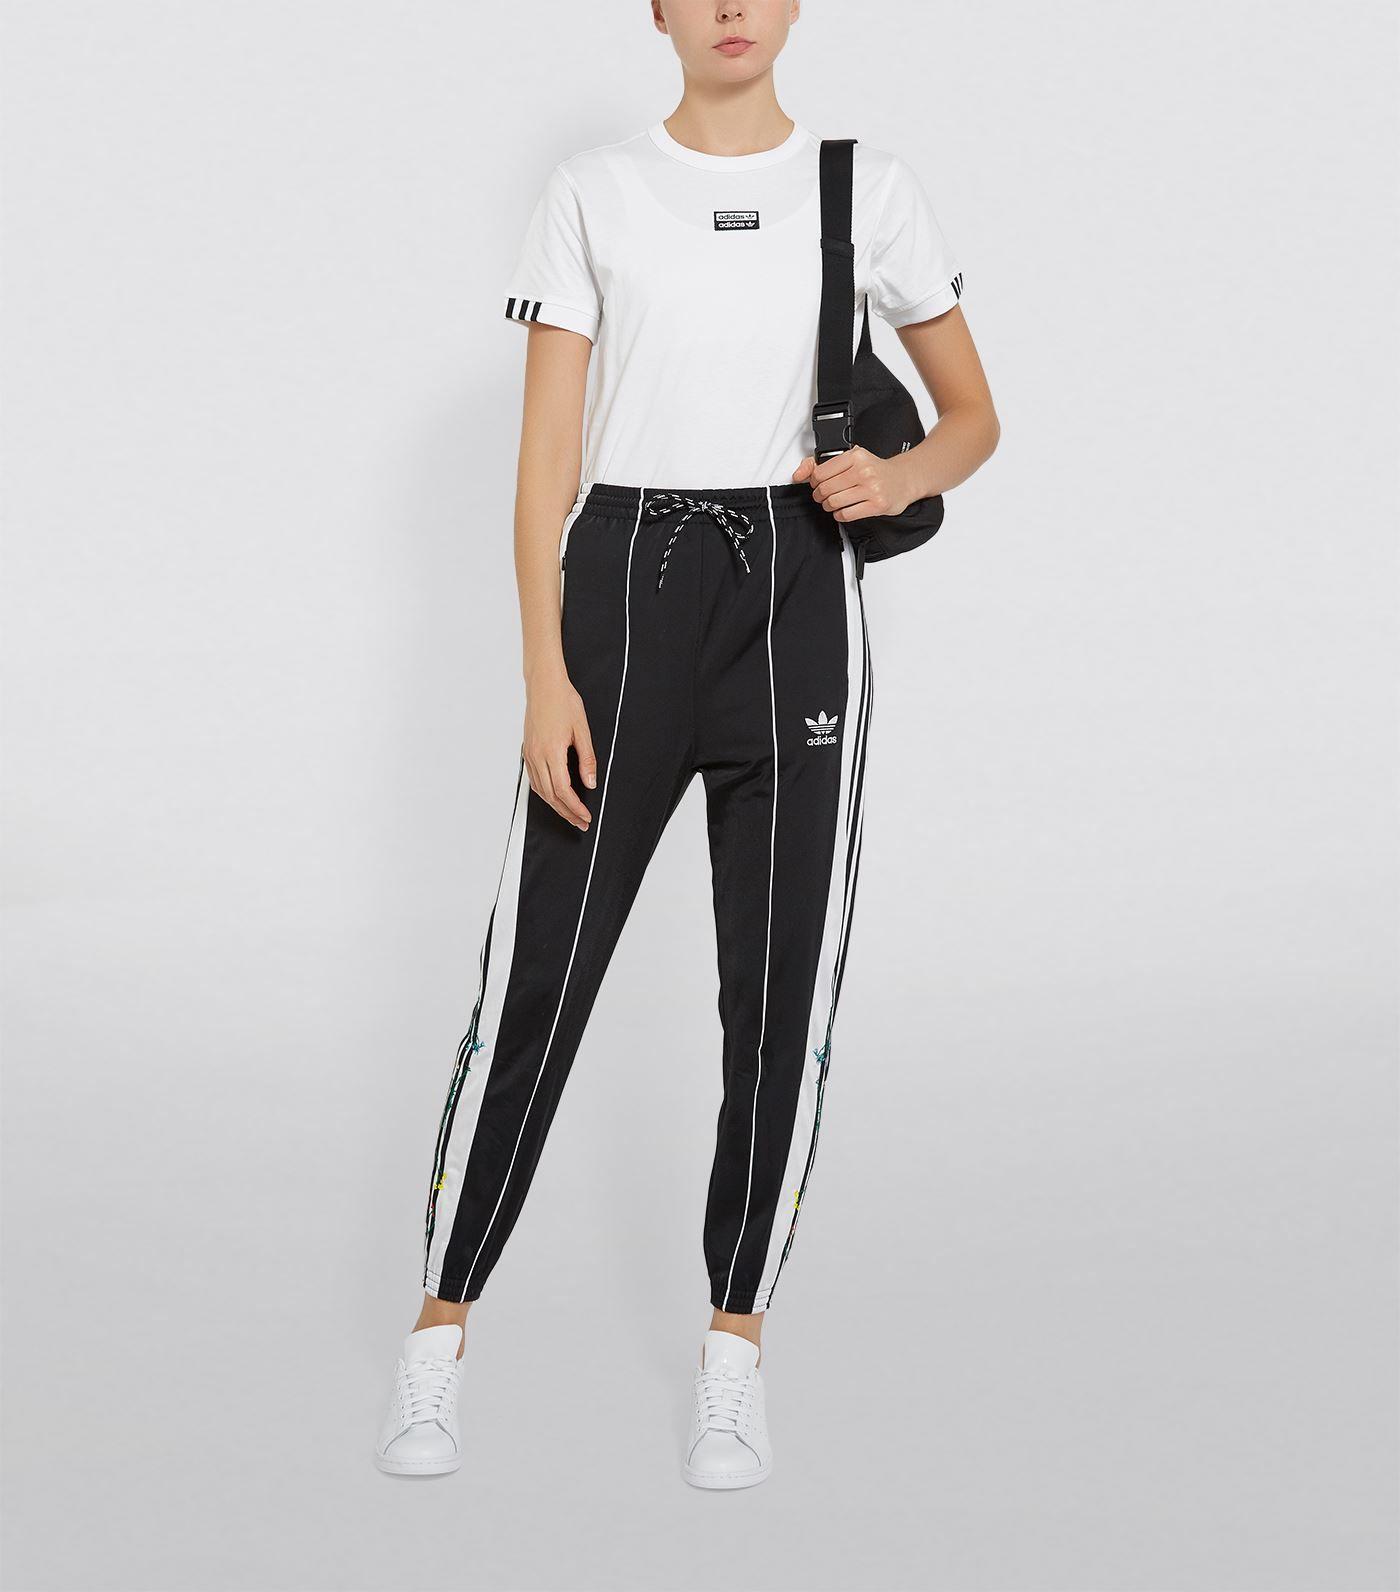 Adidas Originals Floral 3 Stripes Track Trousers Ad Aff Floral Originals Adidas Tro Adidas Track Pants Outfit Track Pants Outfit Adidas Track Pants